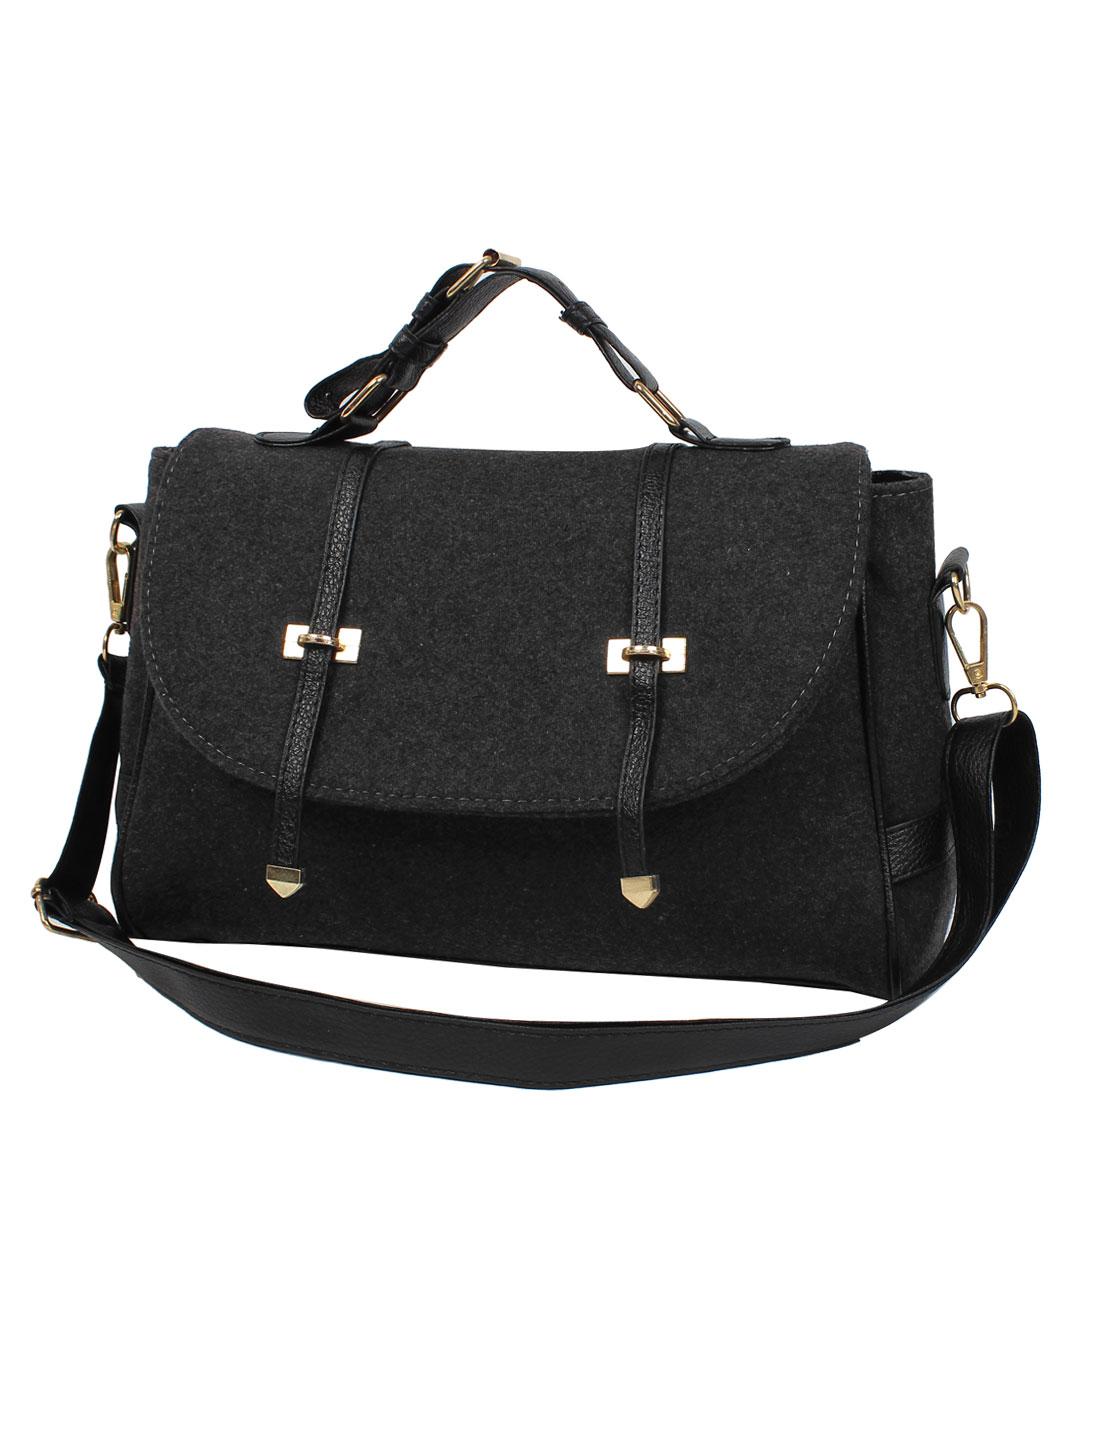 Fashion Nubuck Leather New Women Handbag Tote Shoulder Messenger Hobo Bag Gray